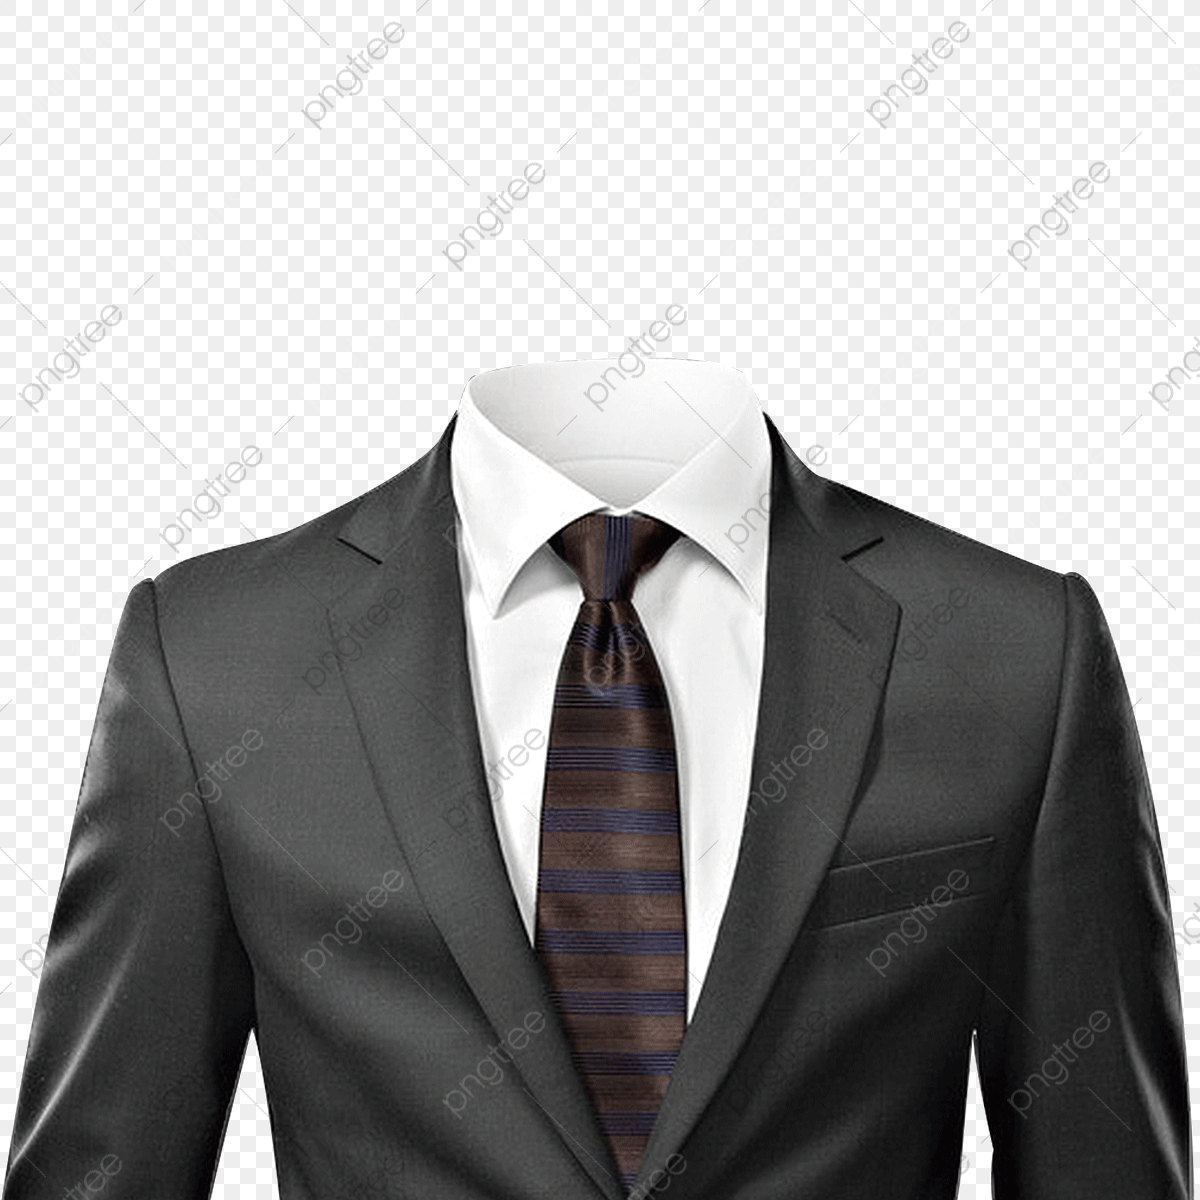 formal attire for men clipart Tuxedo Suit Formal wear clipart - Tuxedo, Suit,  Clothing, transparent clip art